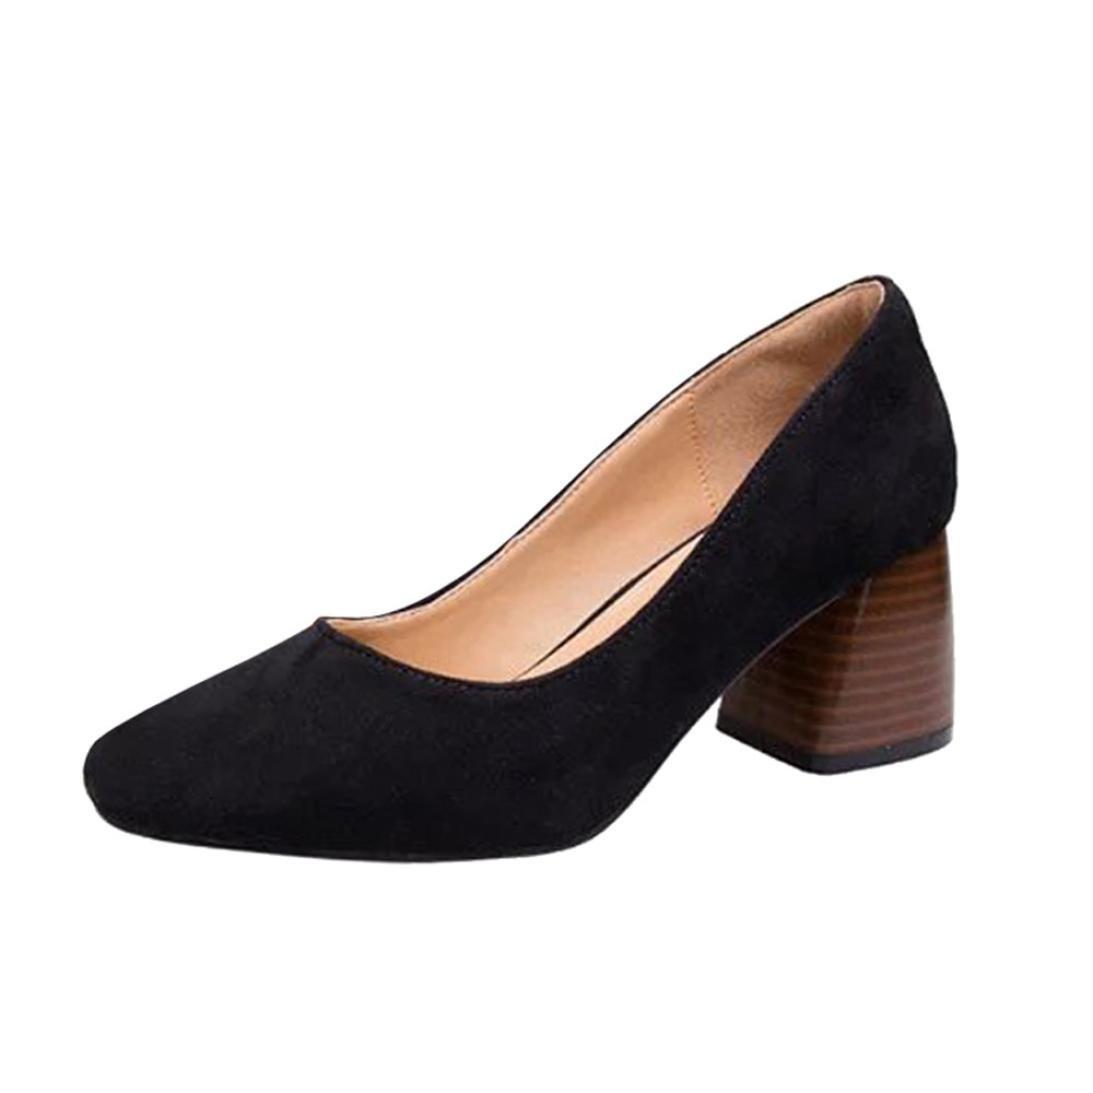 DENER Women Ladies Chunky Heel Shoes Mules,Suede Block Heel Pointed Toe Wide Width Comfort Casual Business Office Shoes (Black, 40)